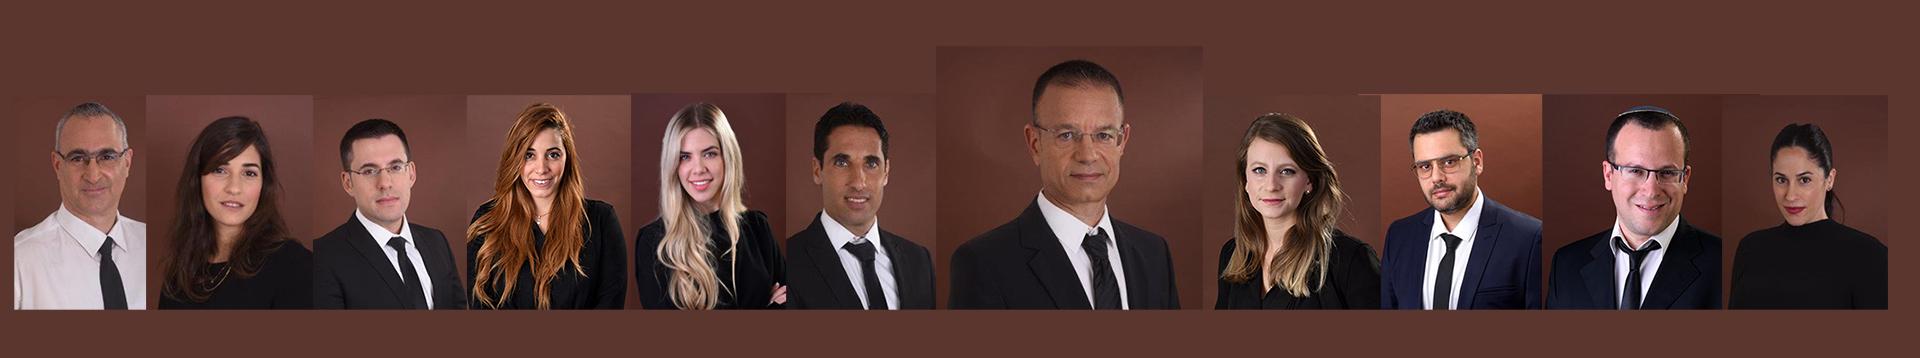 שטרנברג עורכי דין